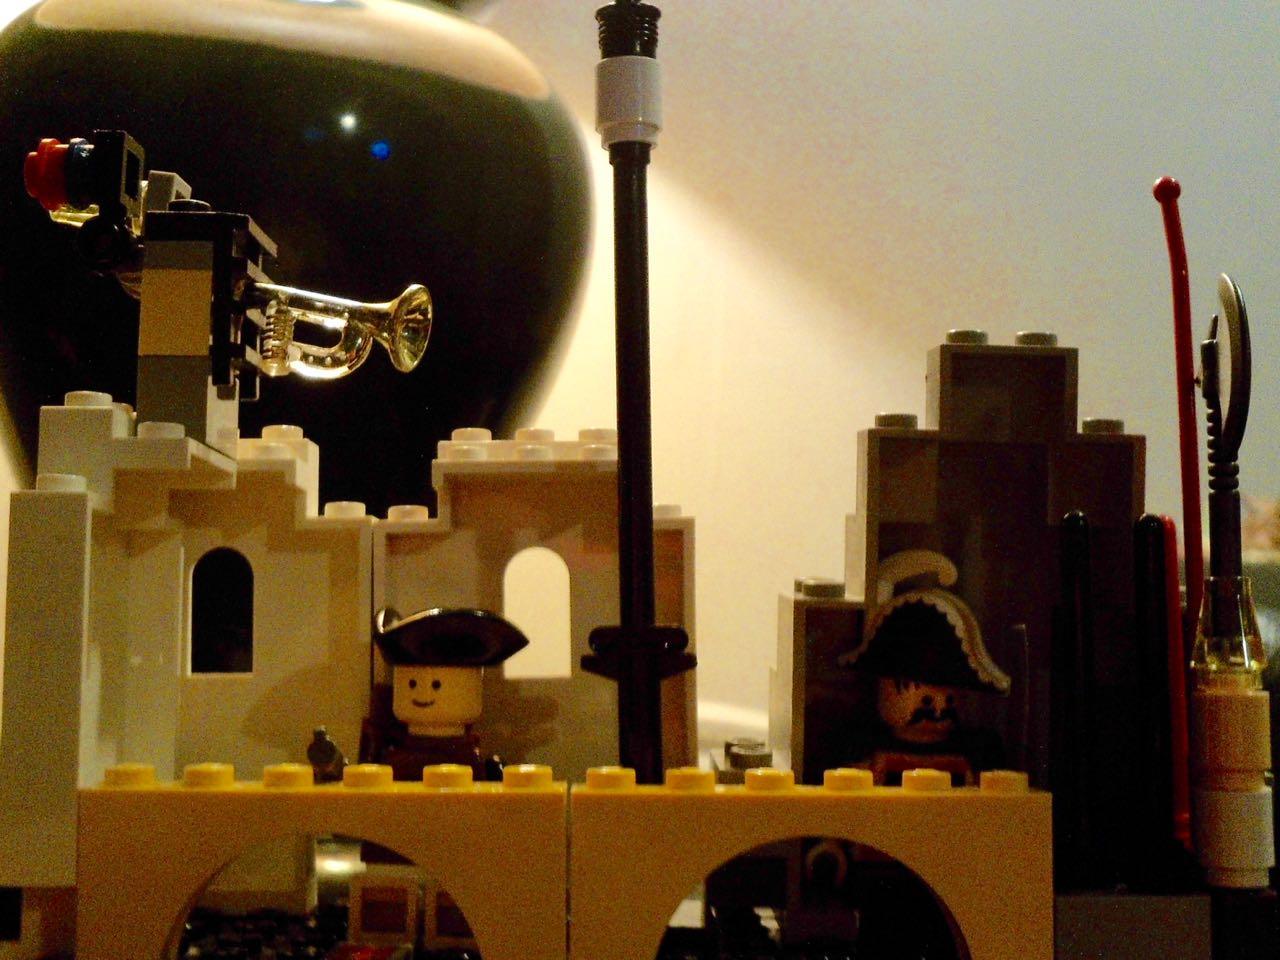 The Castle, by Micah (MJD)